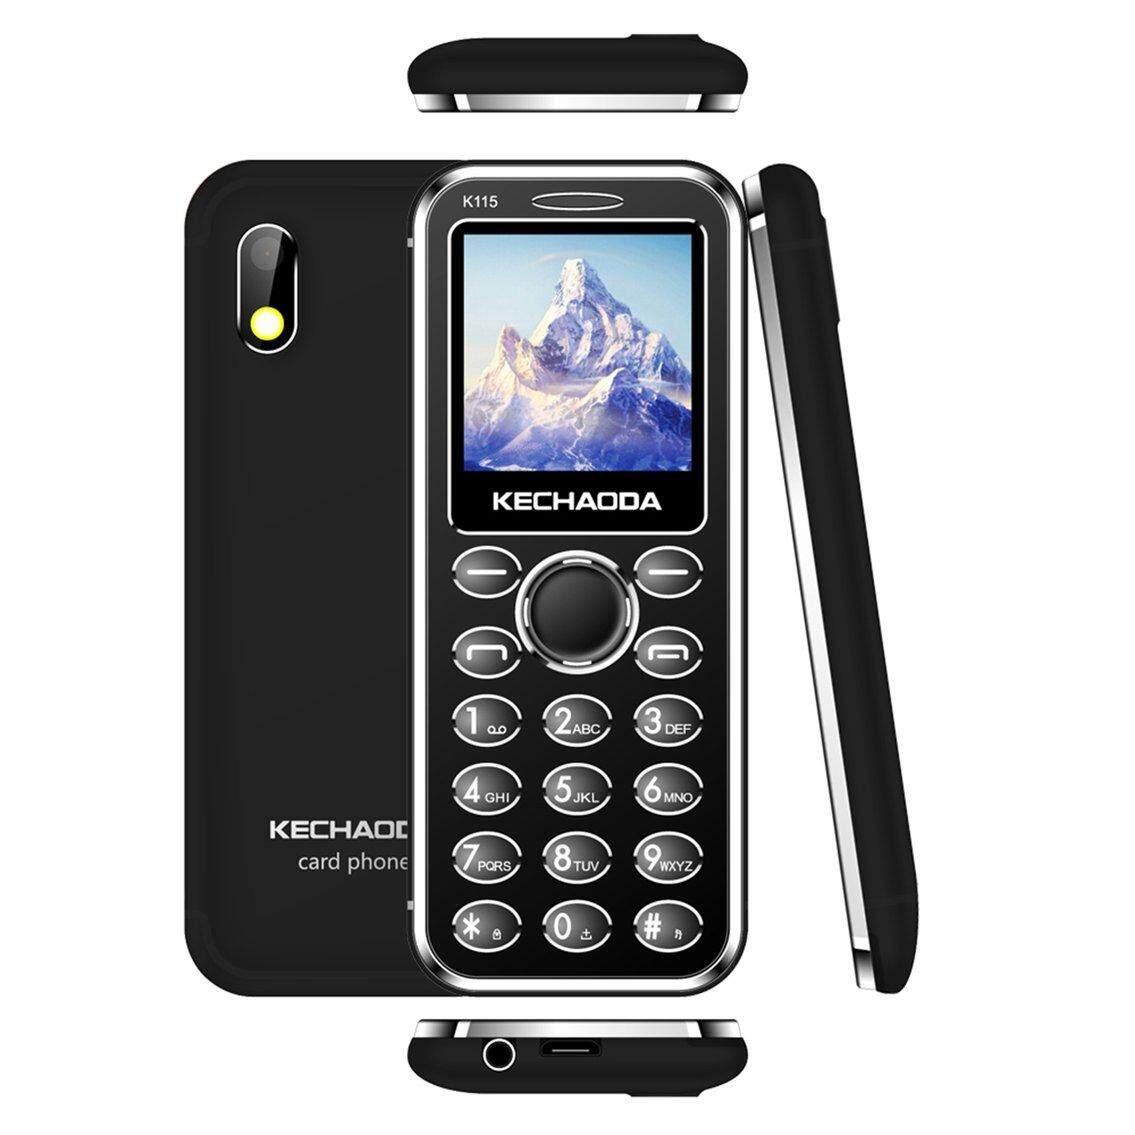 Doit Kechaoda K116 Plus 2g Ultra-Thin Feature Phone Big Sound Phone.